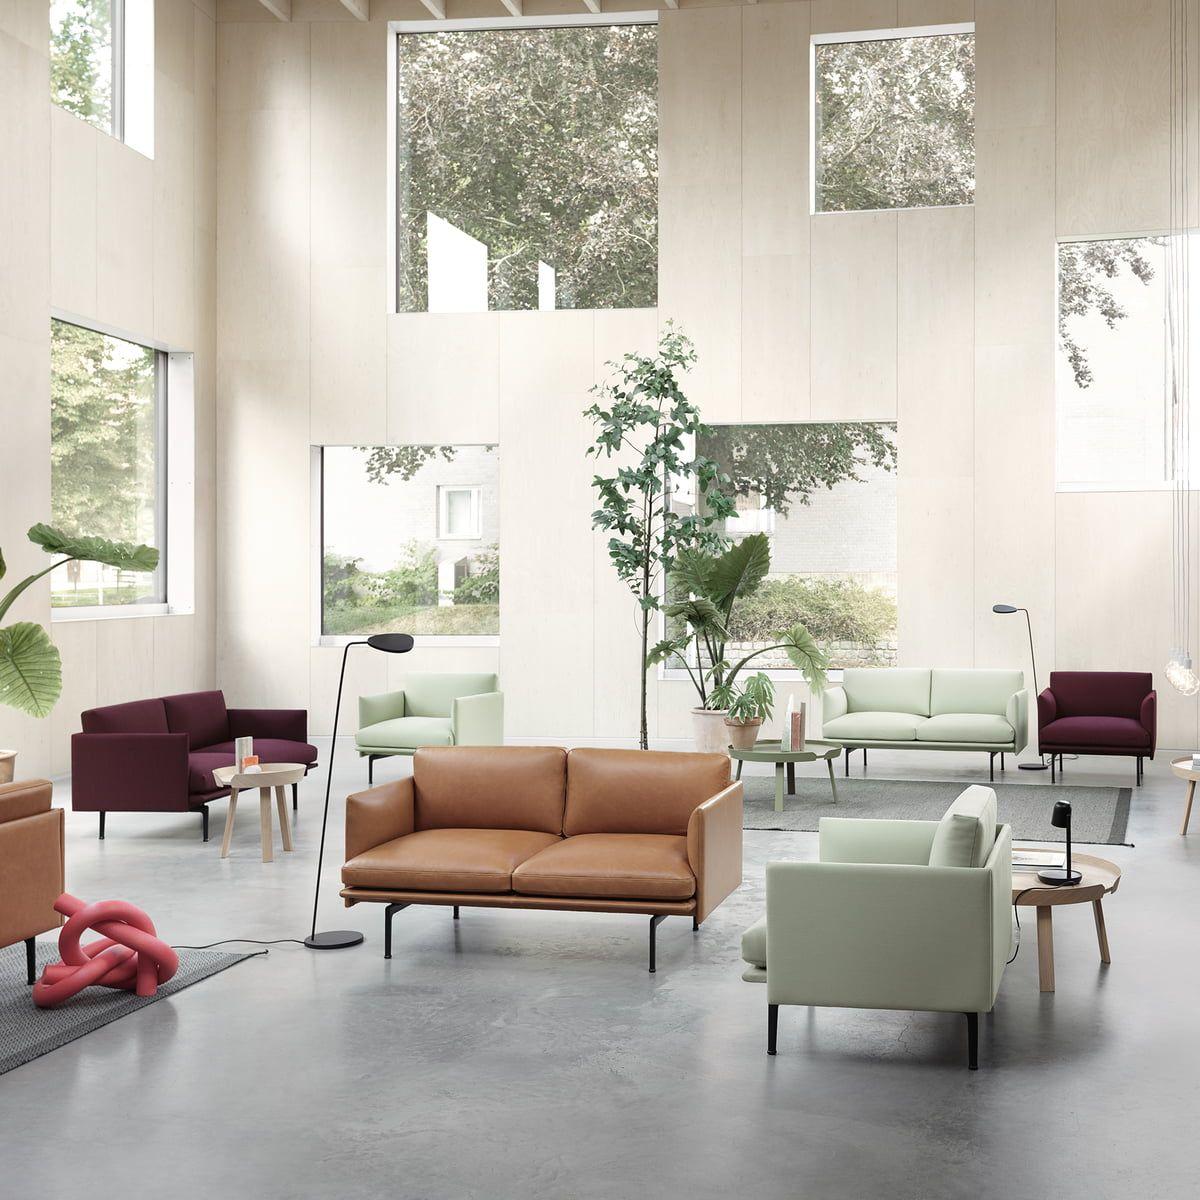 Muuto Outline Studio Sofa 2 Seater Scandinavian Sofa Design Contract Furniture Furniture